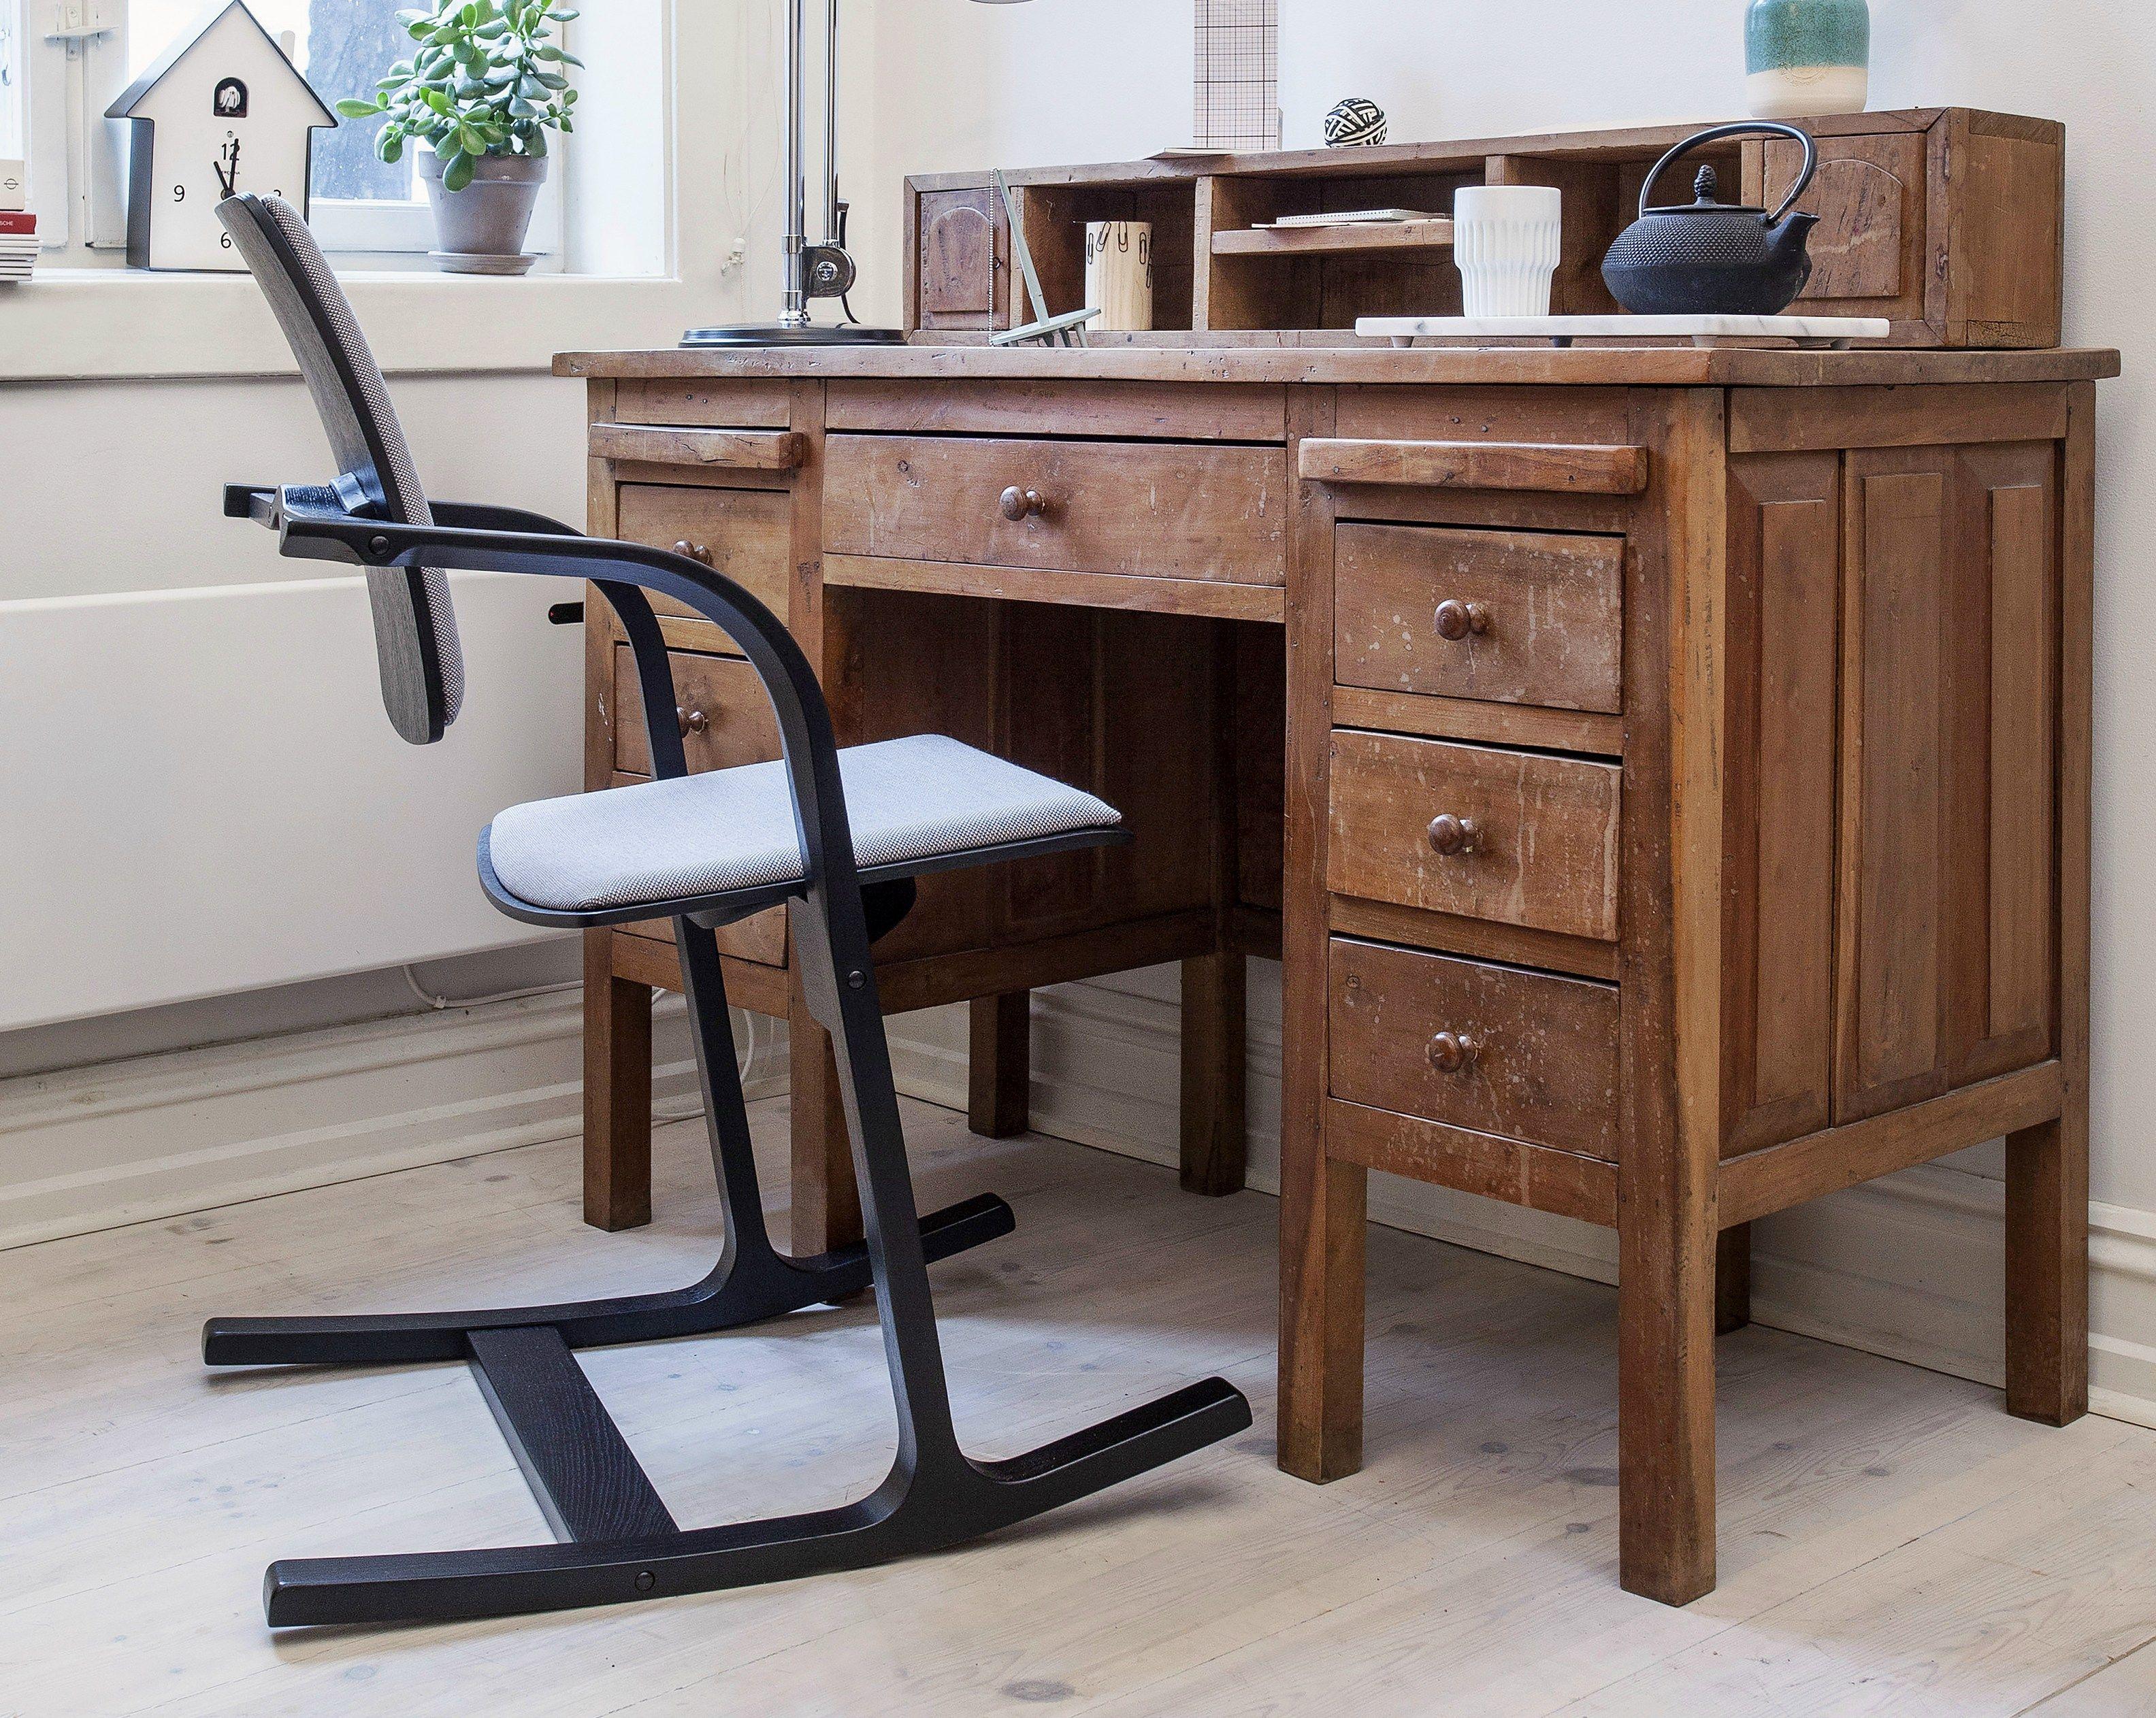 Sgabello varier ~ Actulum rocking chair by peter opsvik for varier furniture